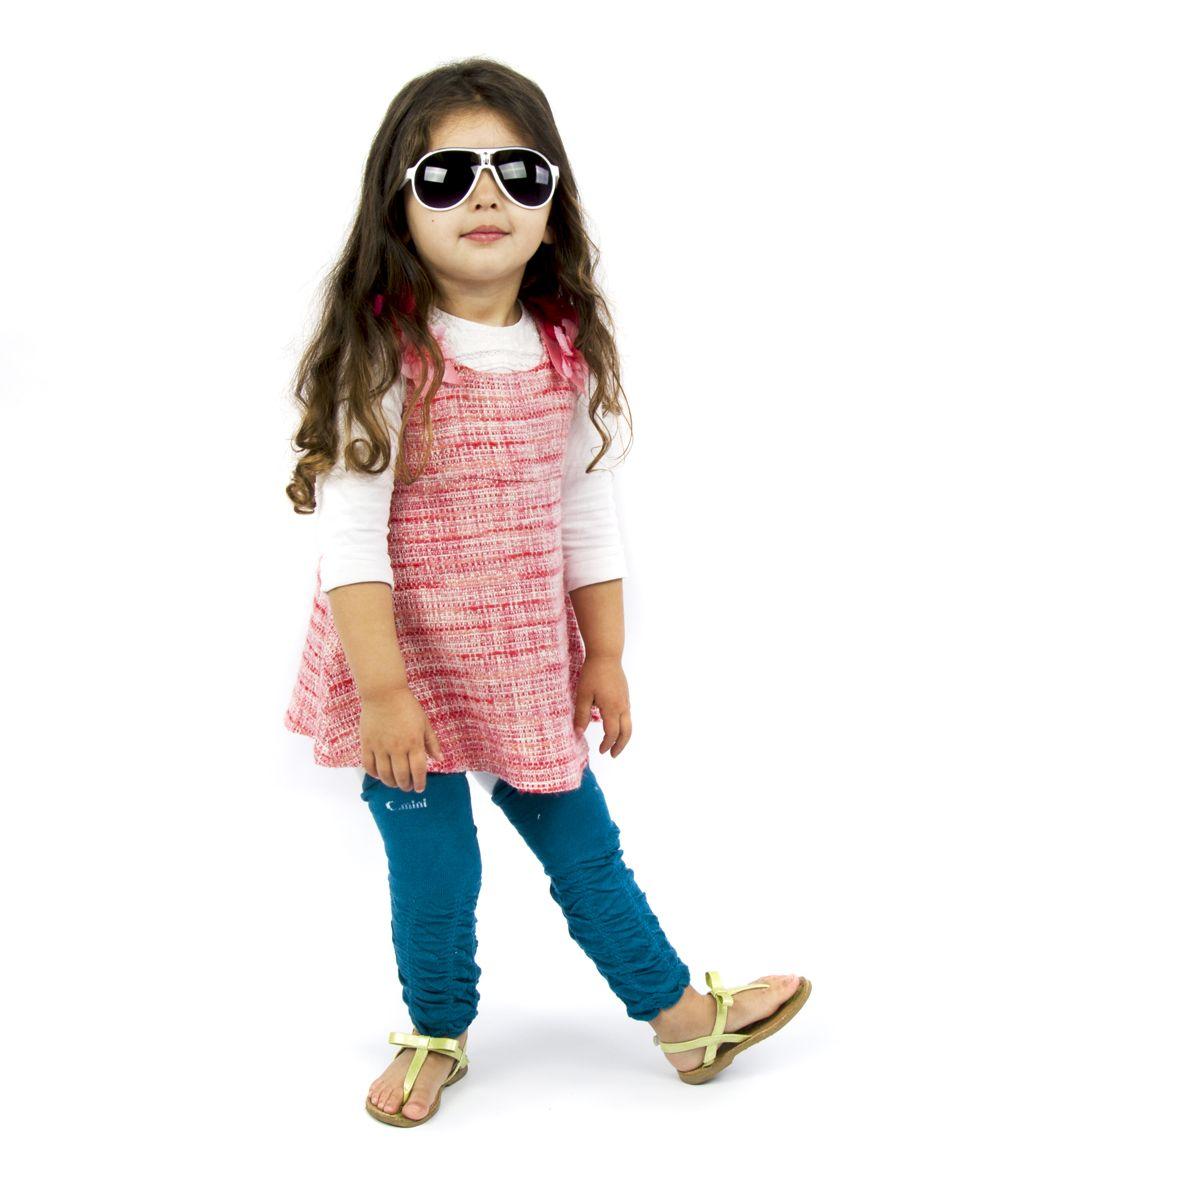 Hamilton's Black and Silver Aviator Style Baby Sunglasses